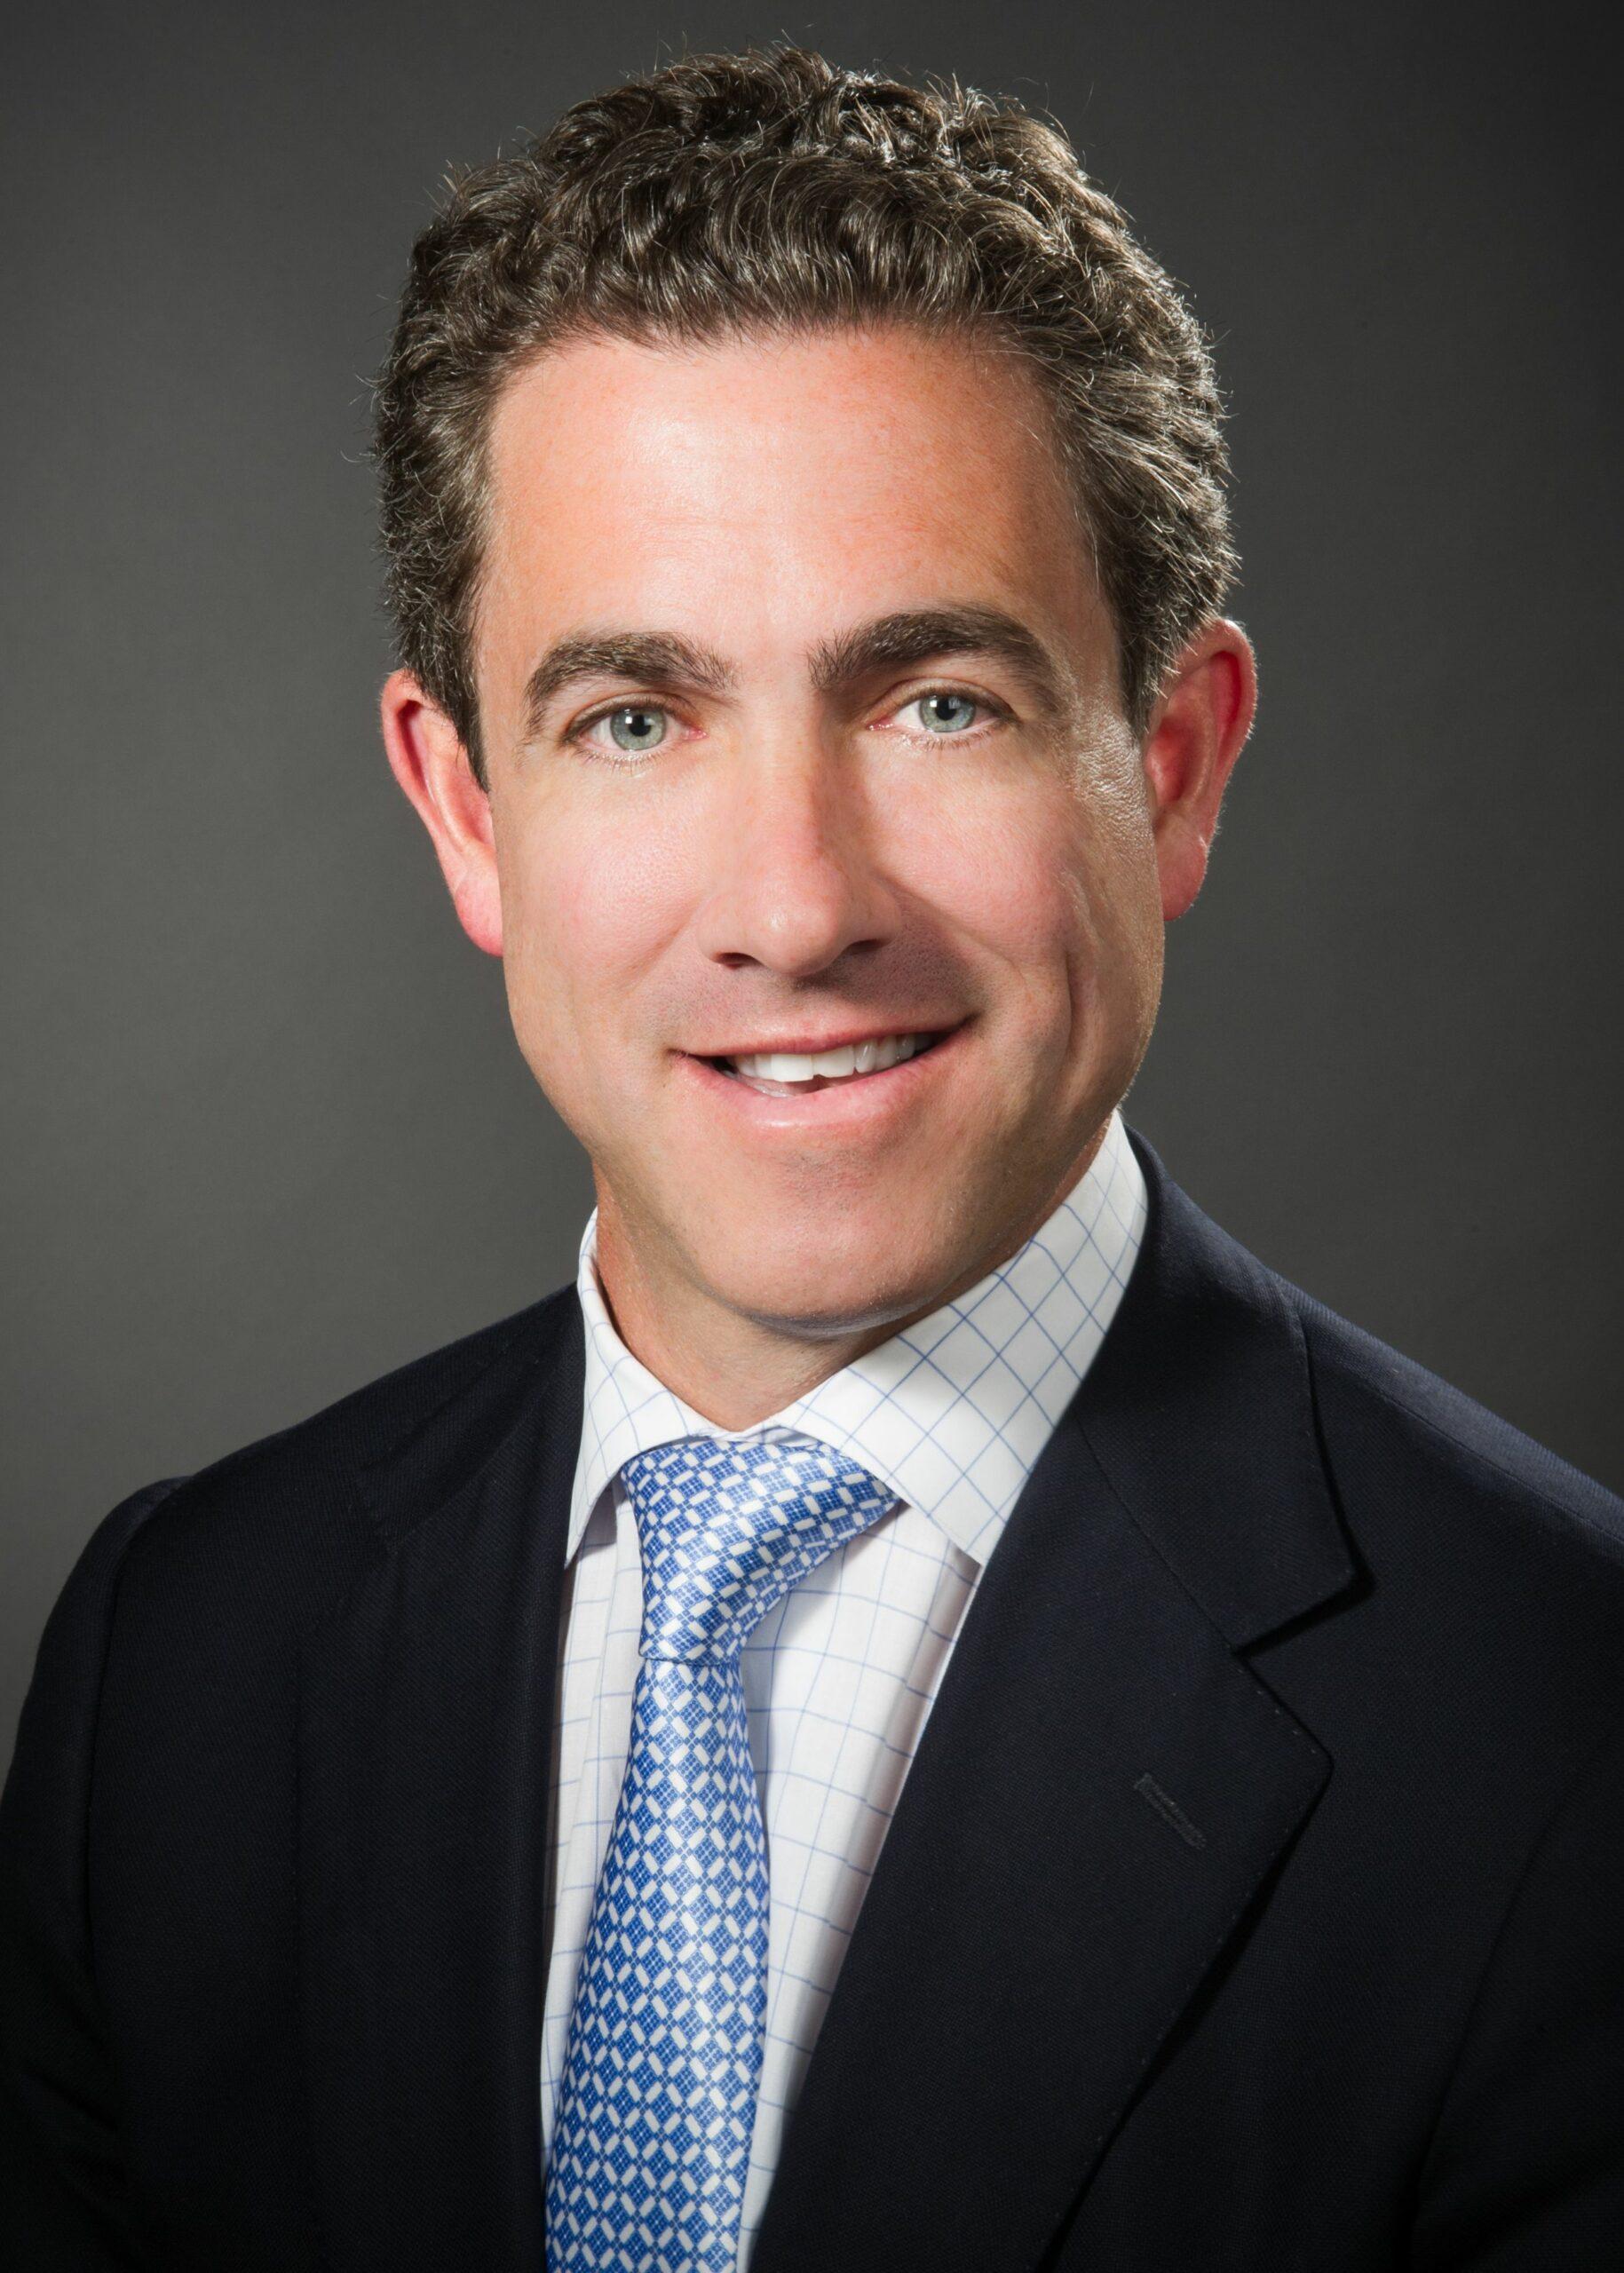 Dr. John Boockvar's profile picture